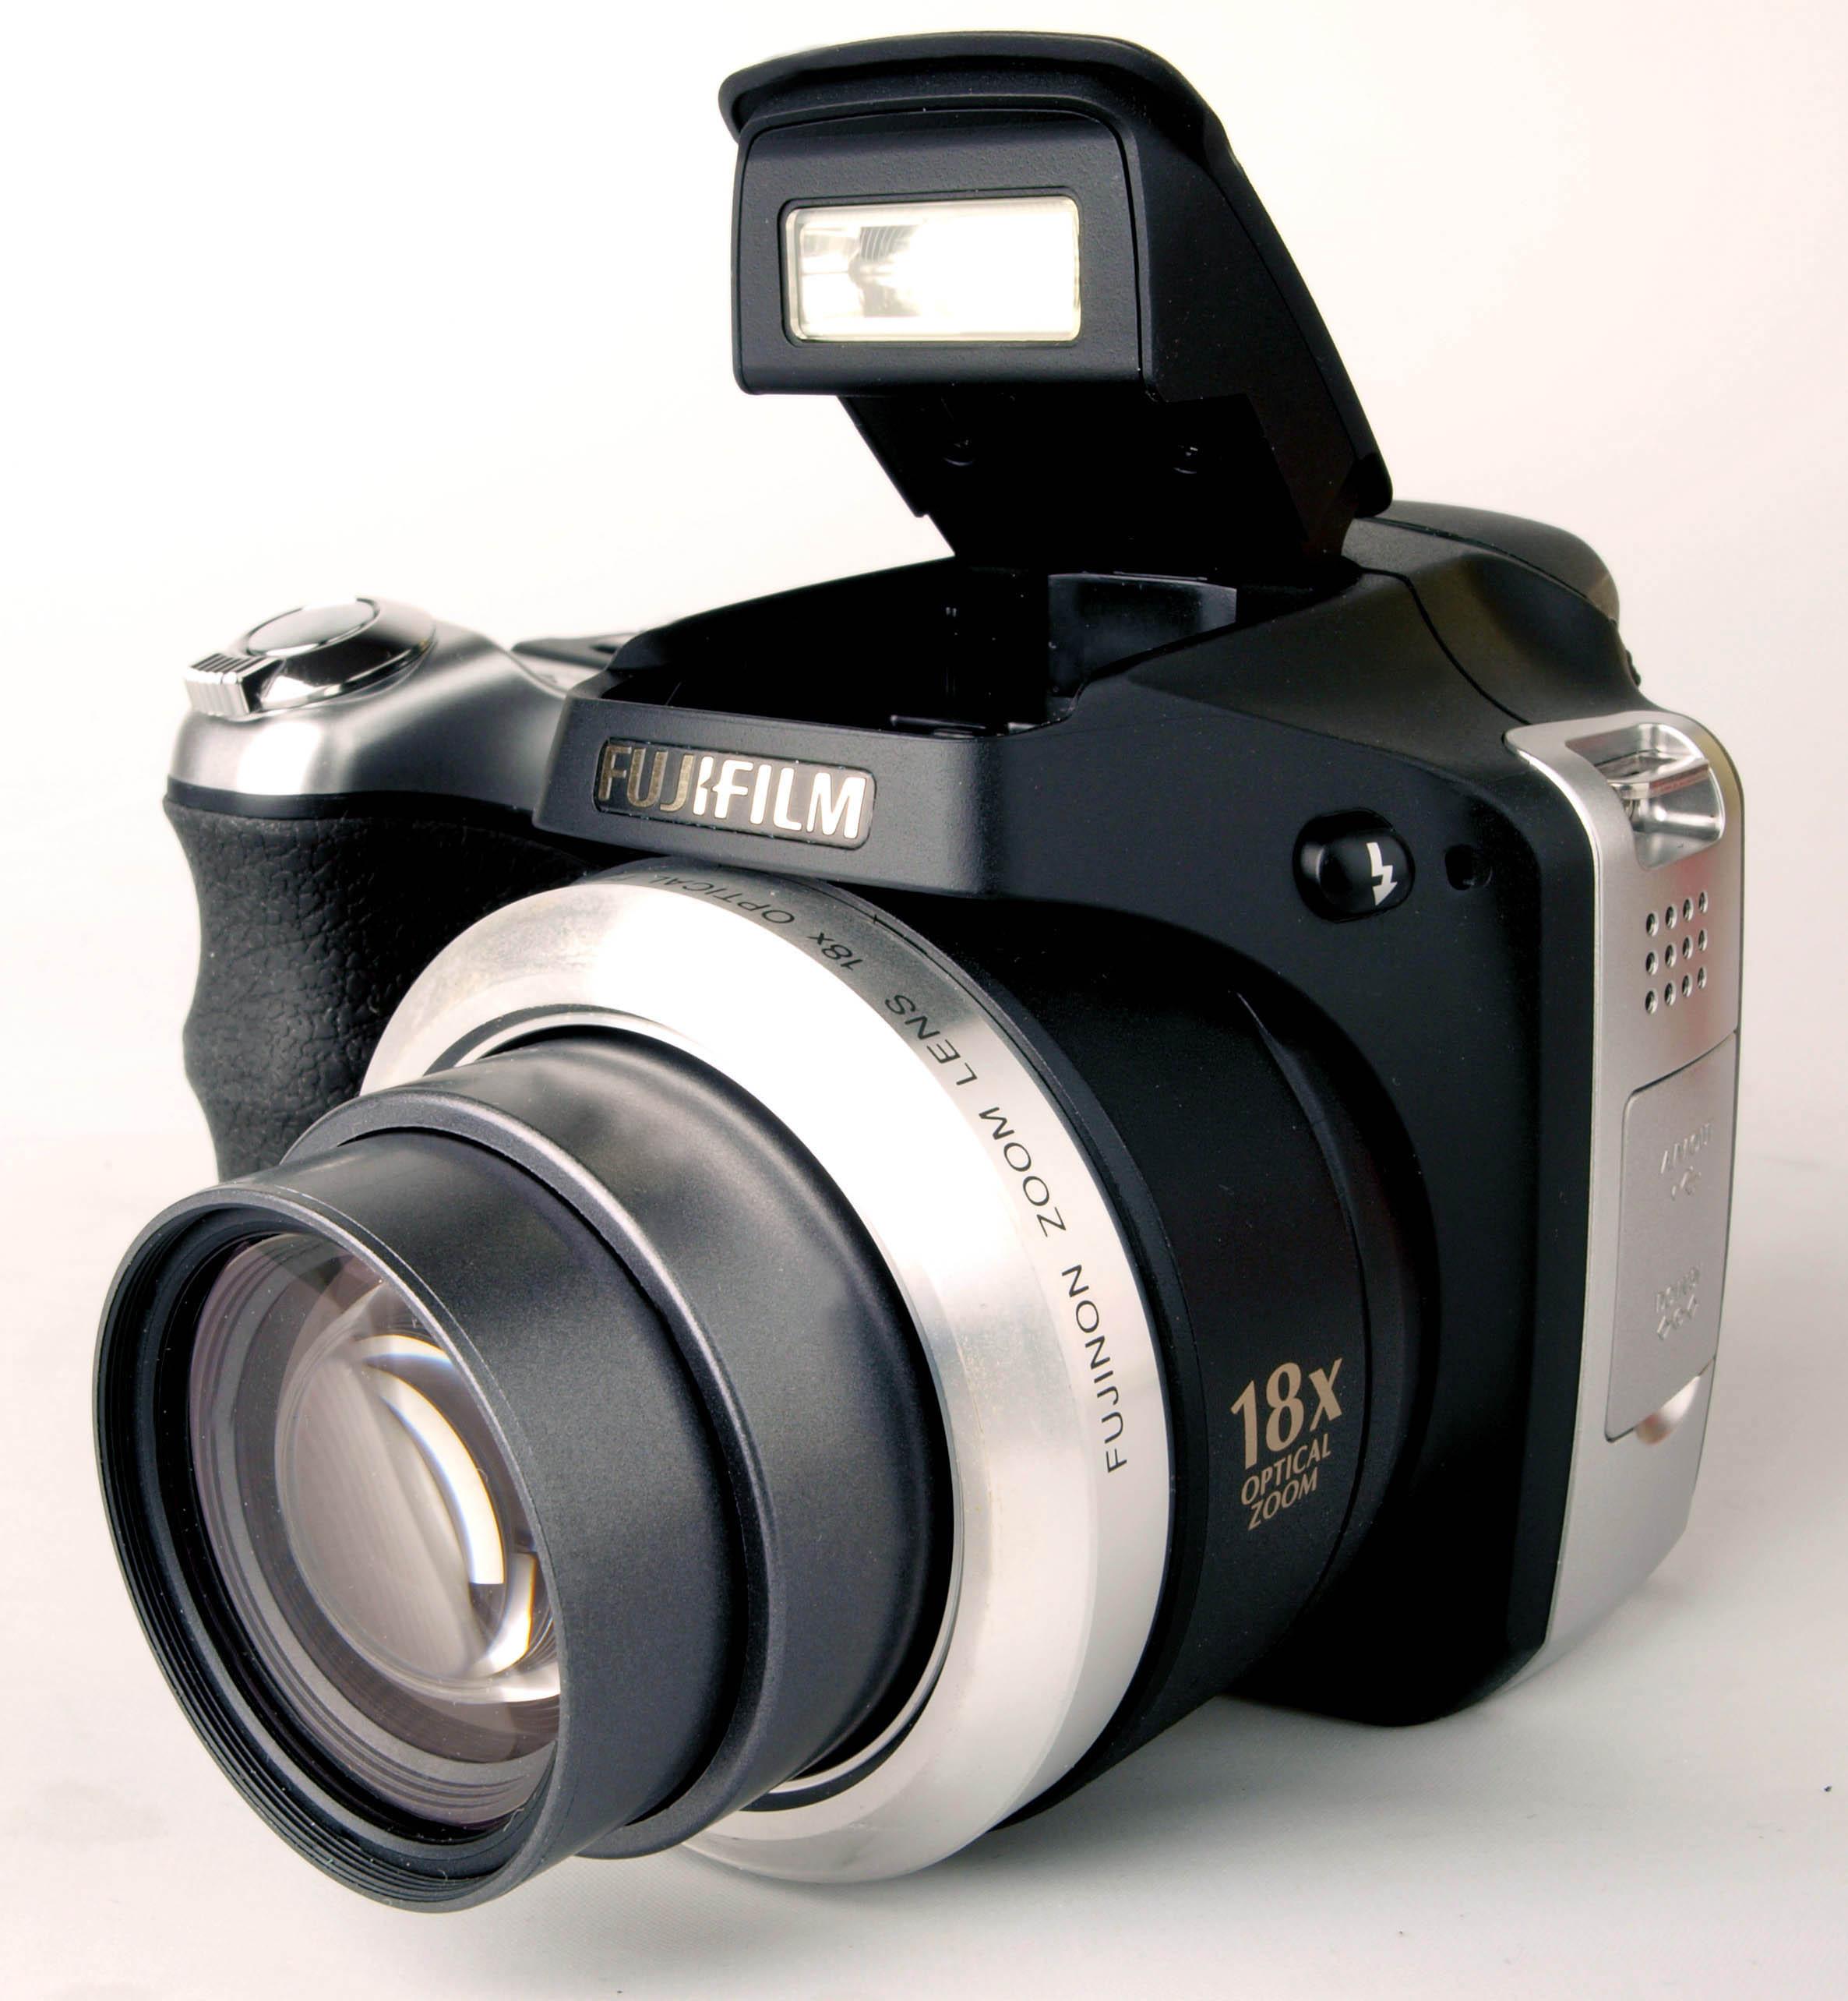 fujifilm finepix s8100fd digital camera review rh ephotozine com Fuji FinePix HS25EXR Fuji FinePix HS25EXR